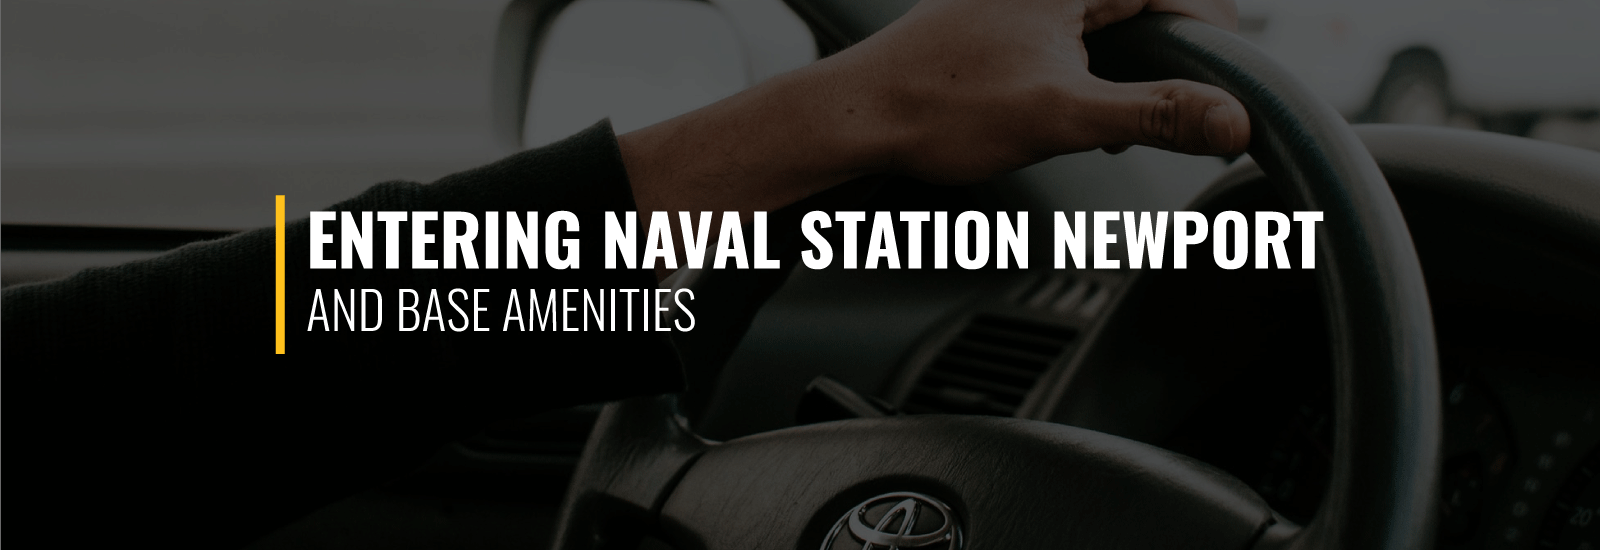 Entering Naval Station Newport